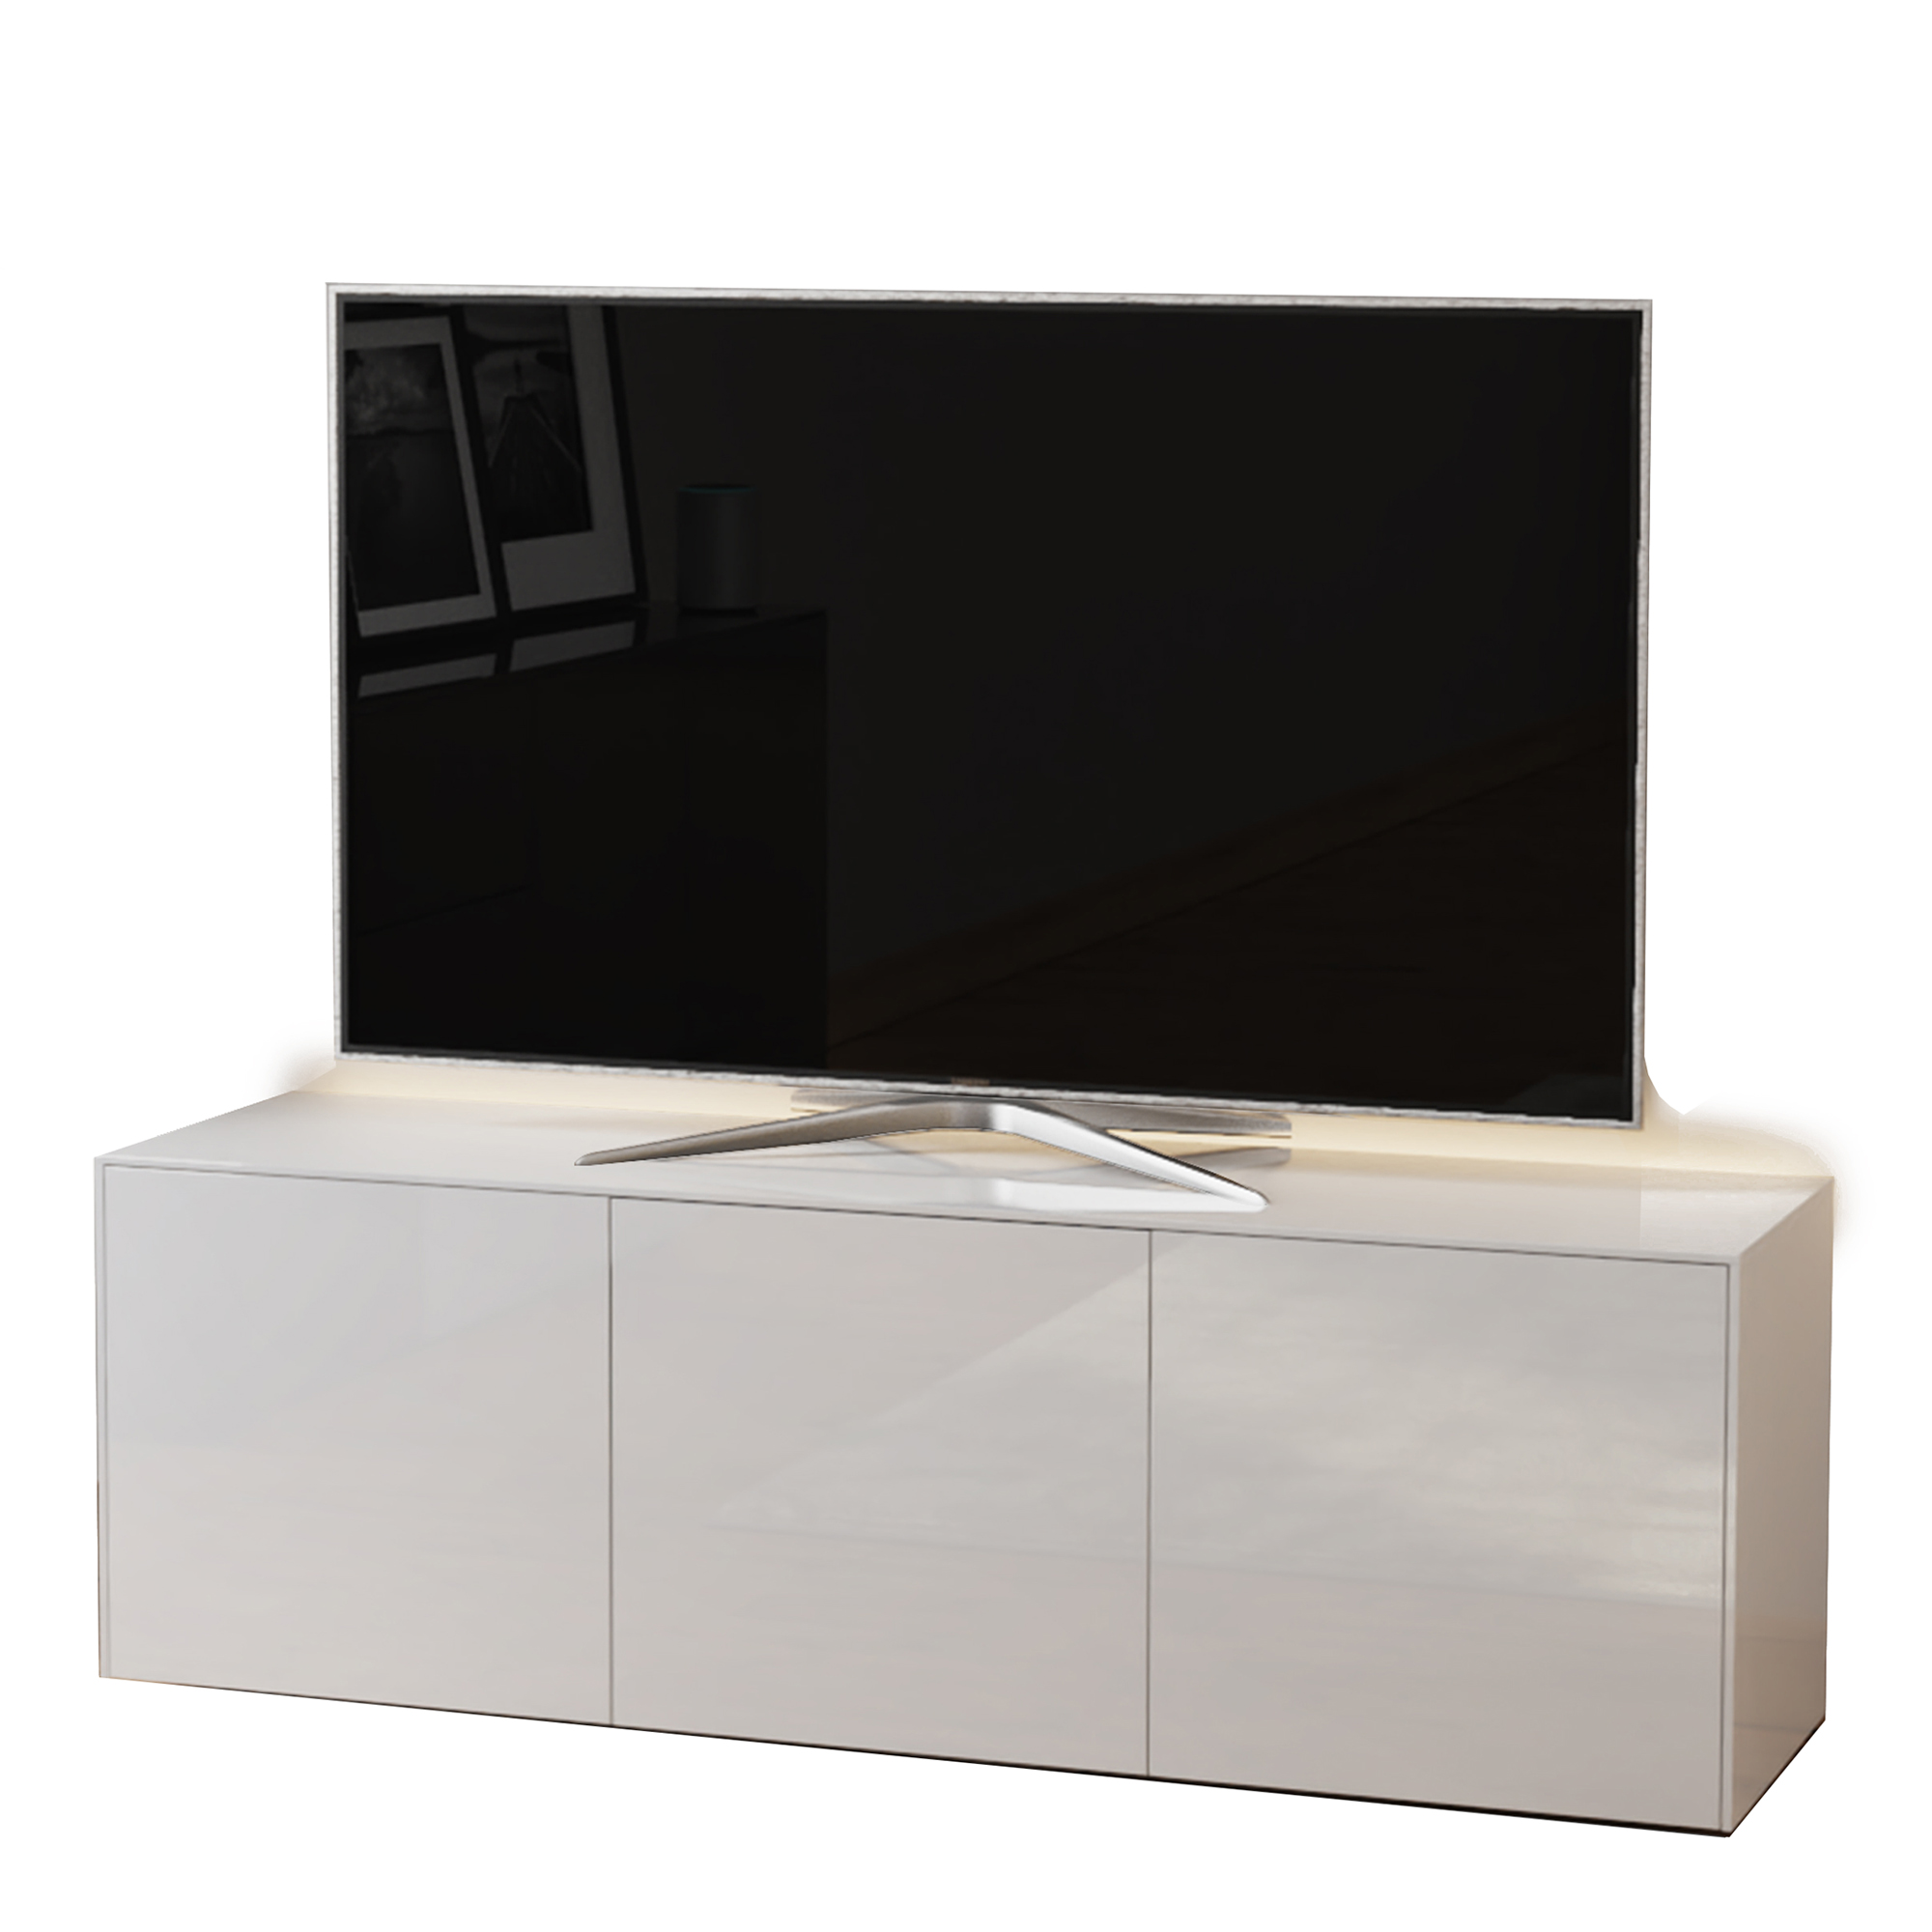 paragon 150cm tv unit in white gloss